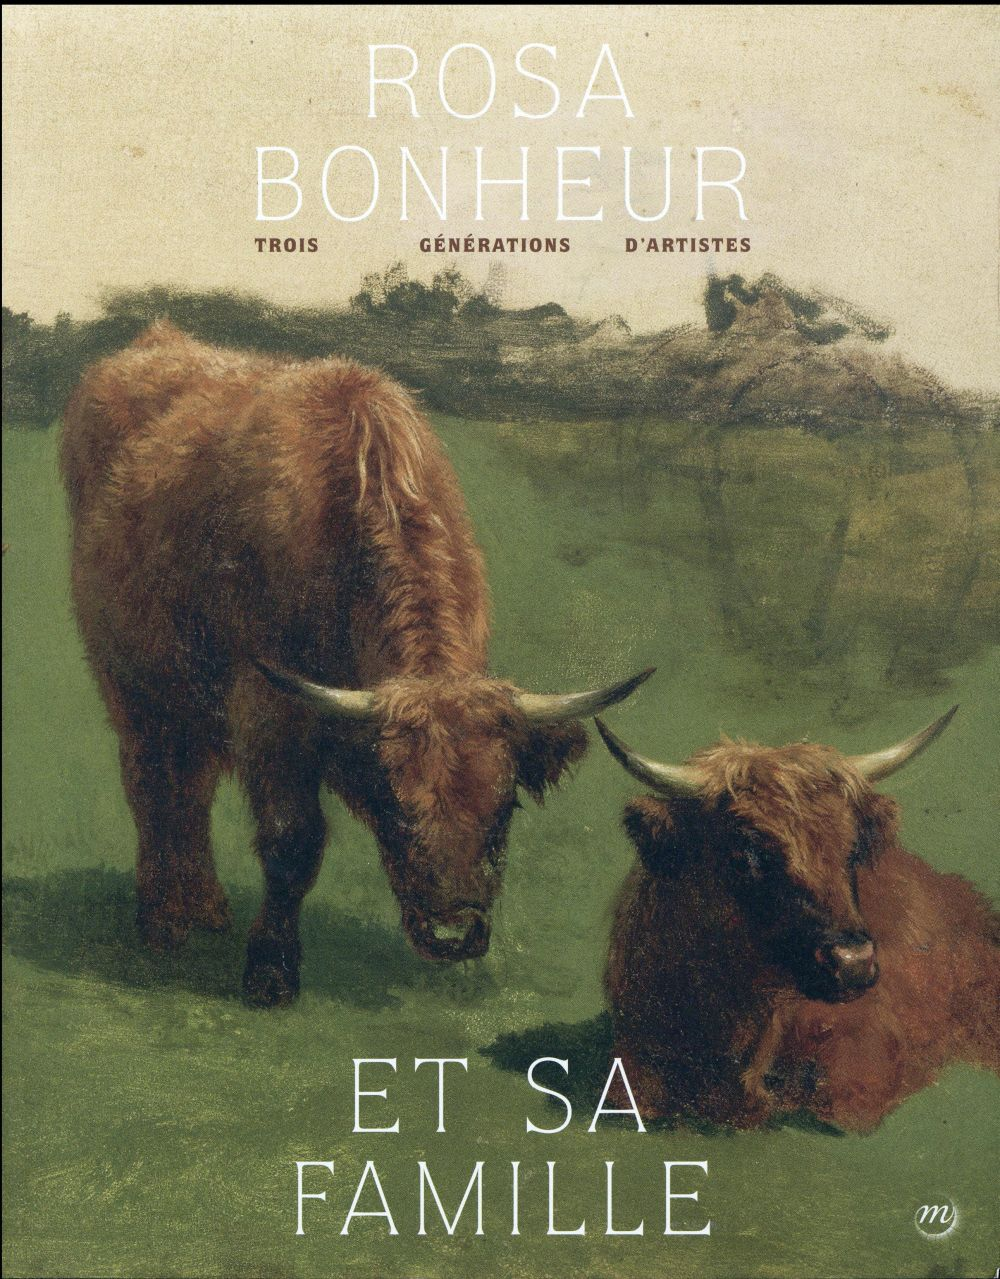 ROSA BONHEUR - TROIS GENERATIONS D'ARTISTES